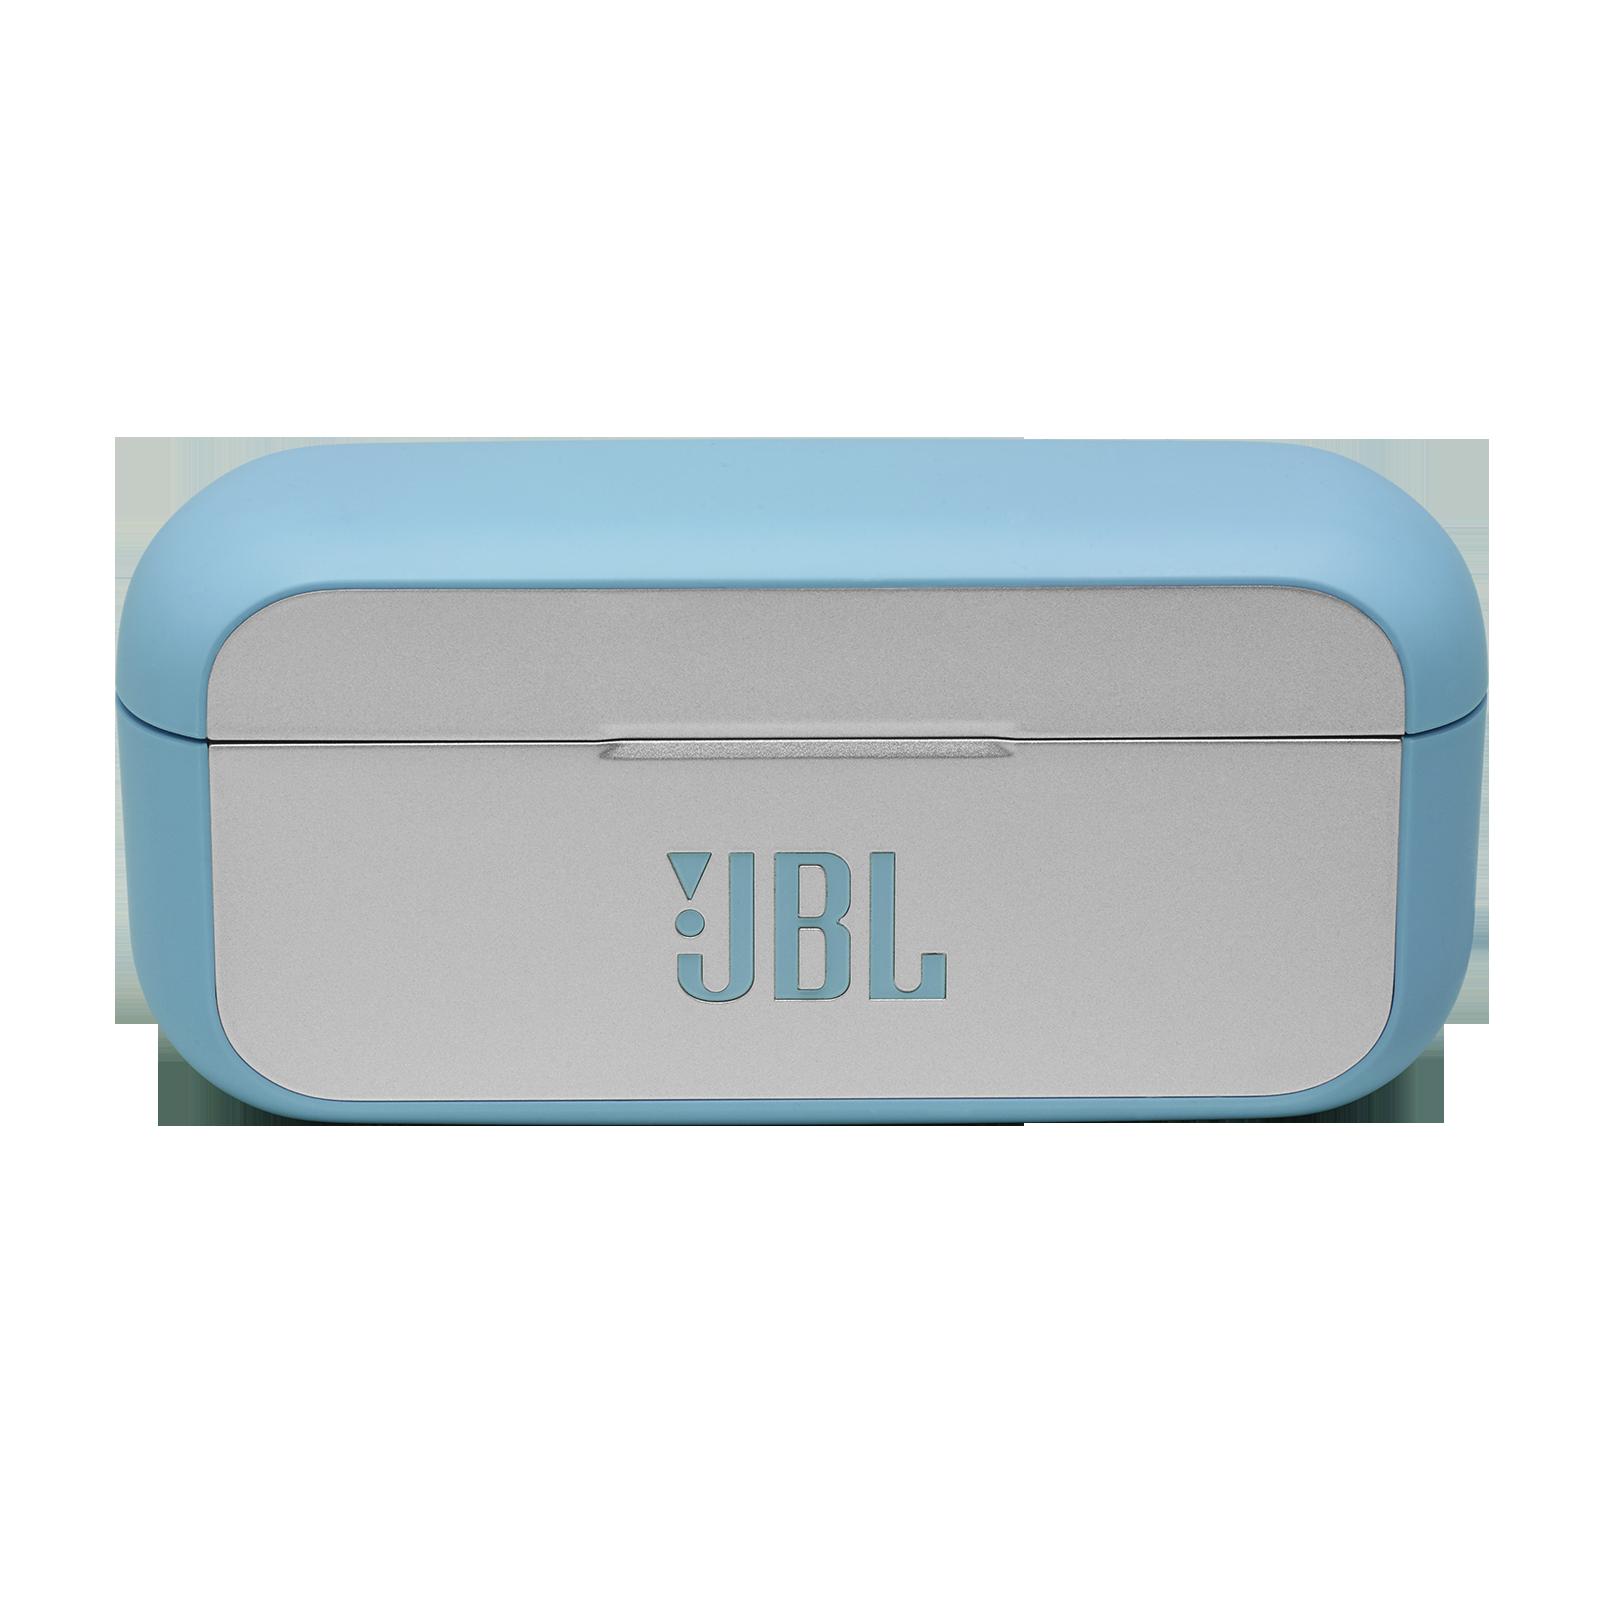 JBL REFLECT FLOW - Teal - True wireless sport headphones. - Detailshot 4